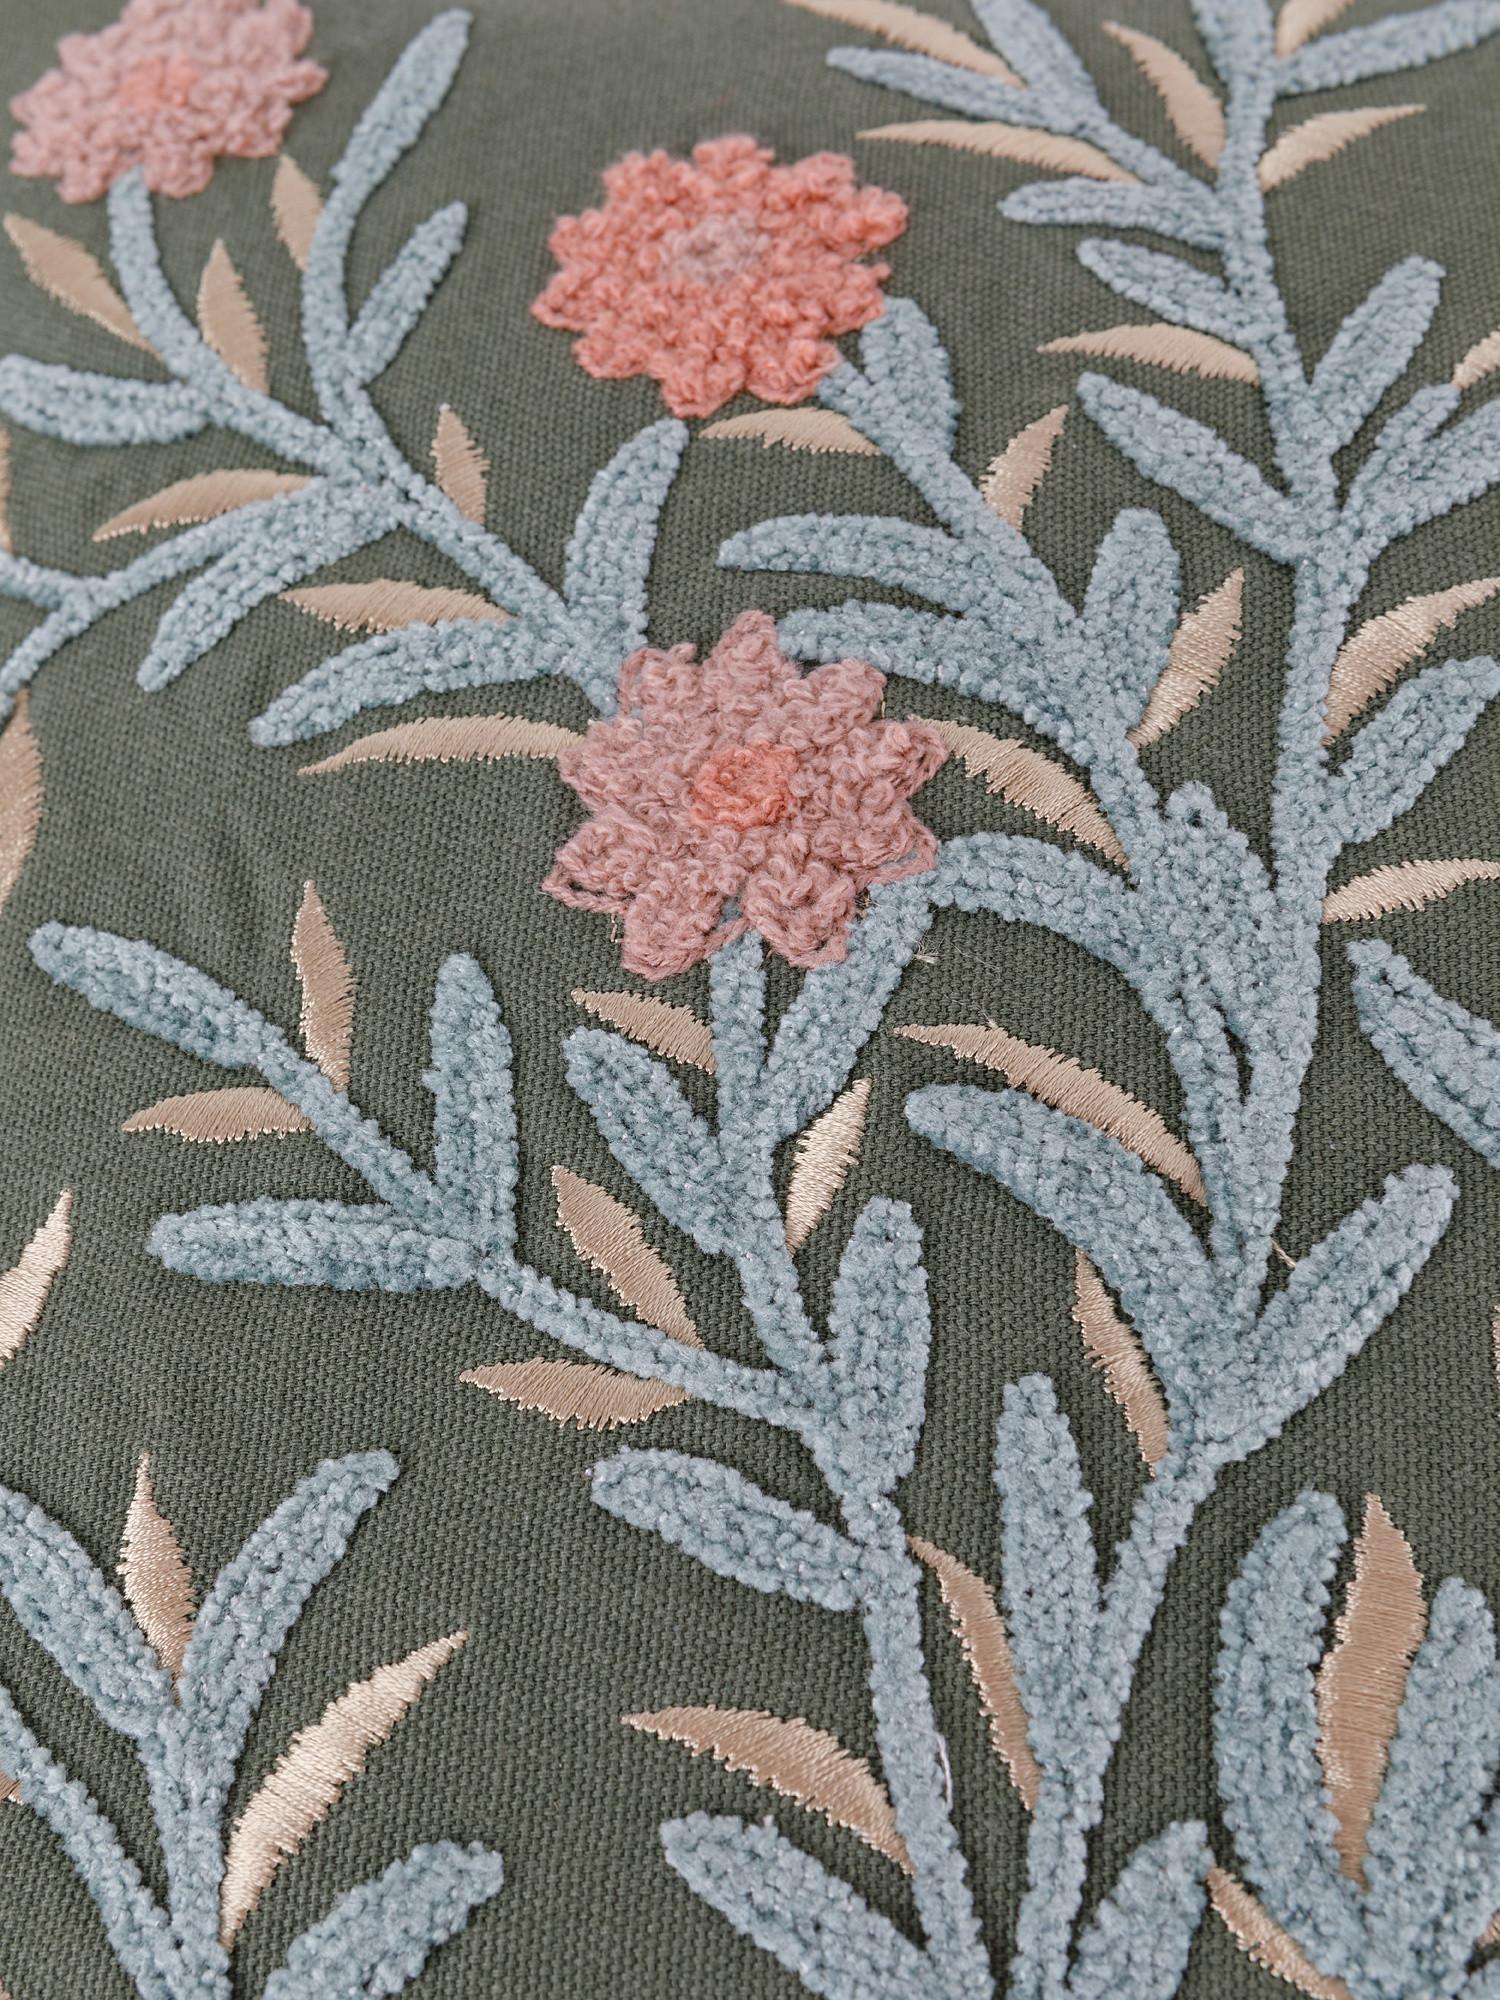 Cuscino cotone ricamo ramage 45x45cm, Multicolor, large image number 2